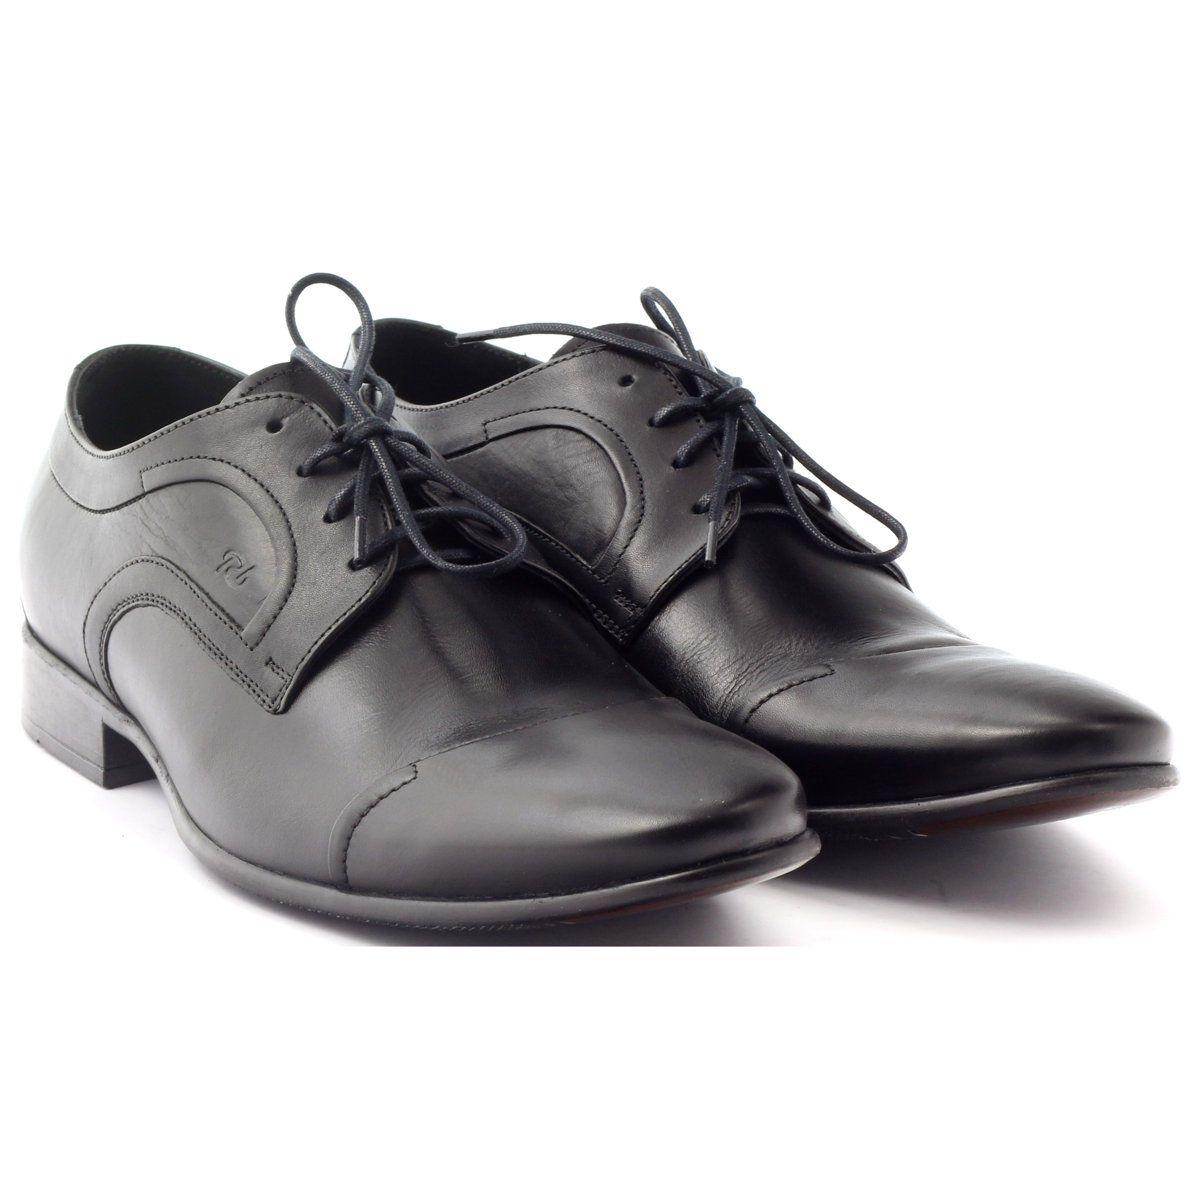 Polbuty Skorzane Buty Meskie Pilpol 1262 Czarne Womens Oxfords Oxford Shoes Shoes